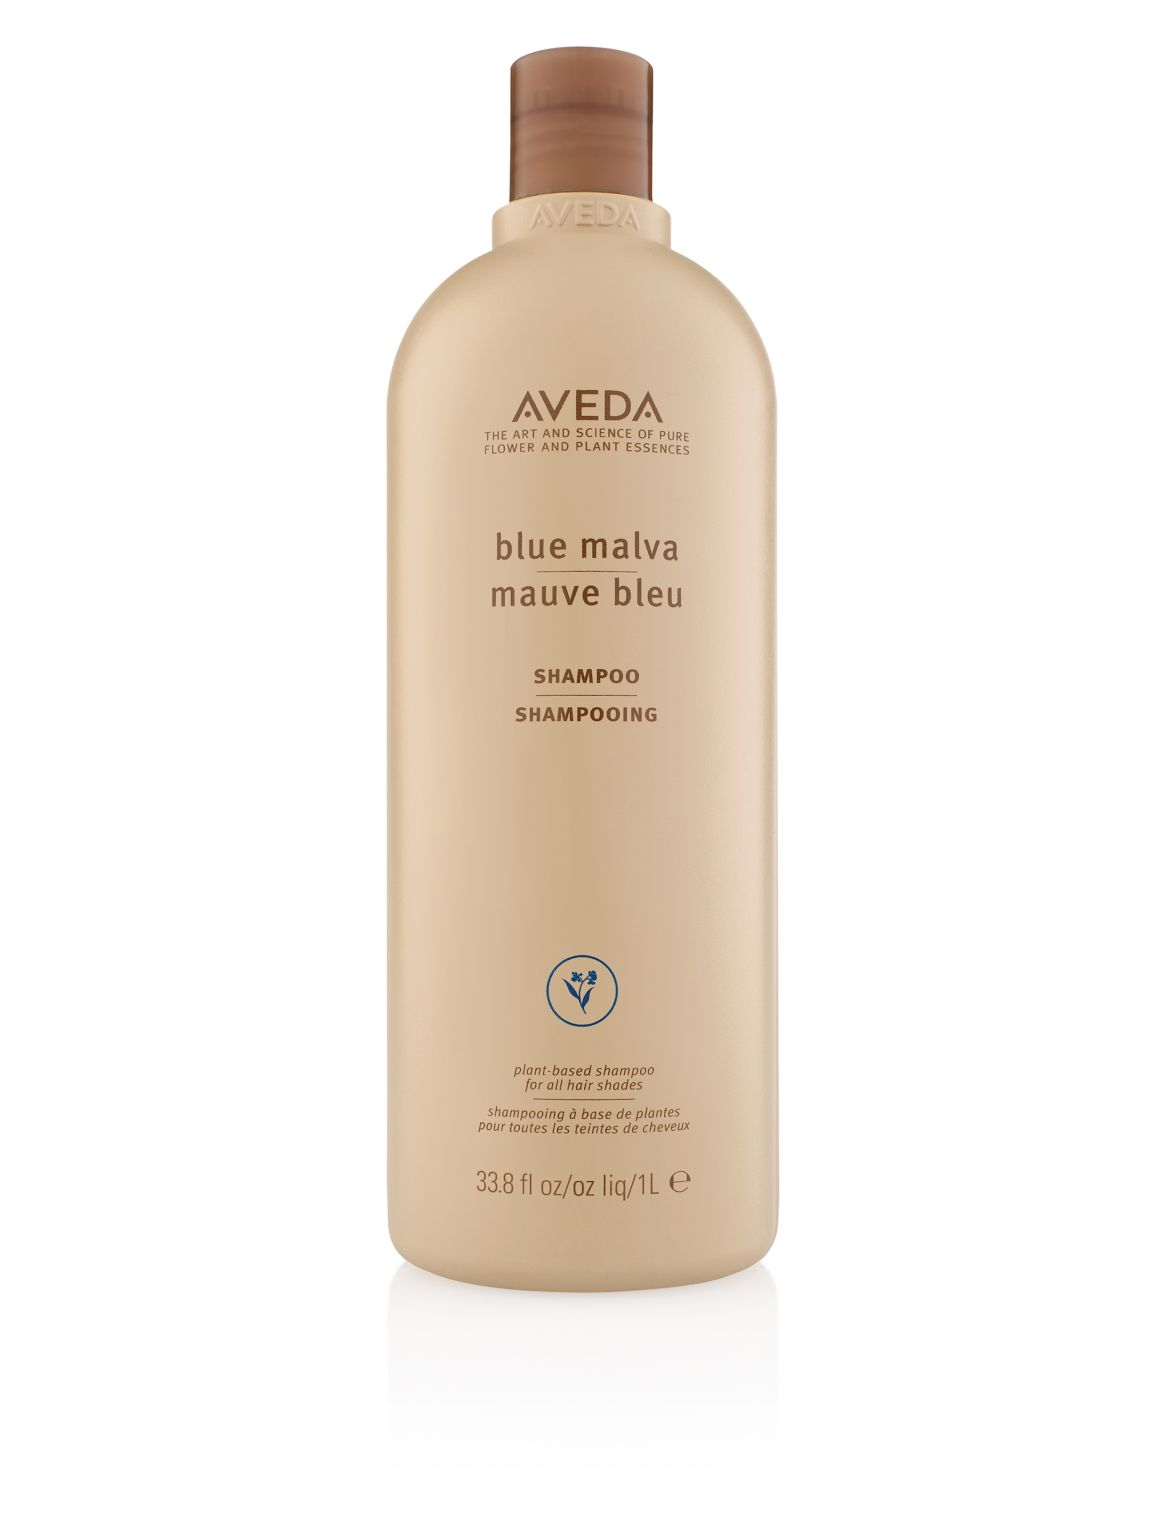 1 Litre Blue Malva Shampoo - *Save 25% per ml